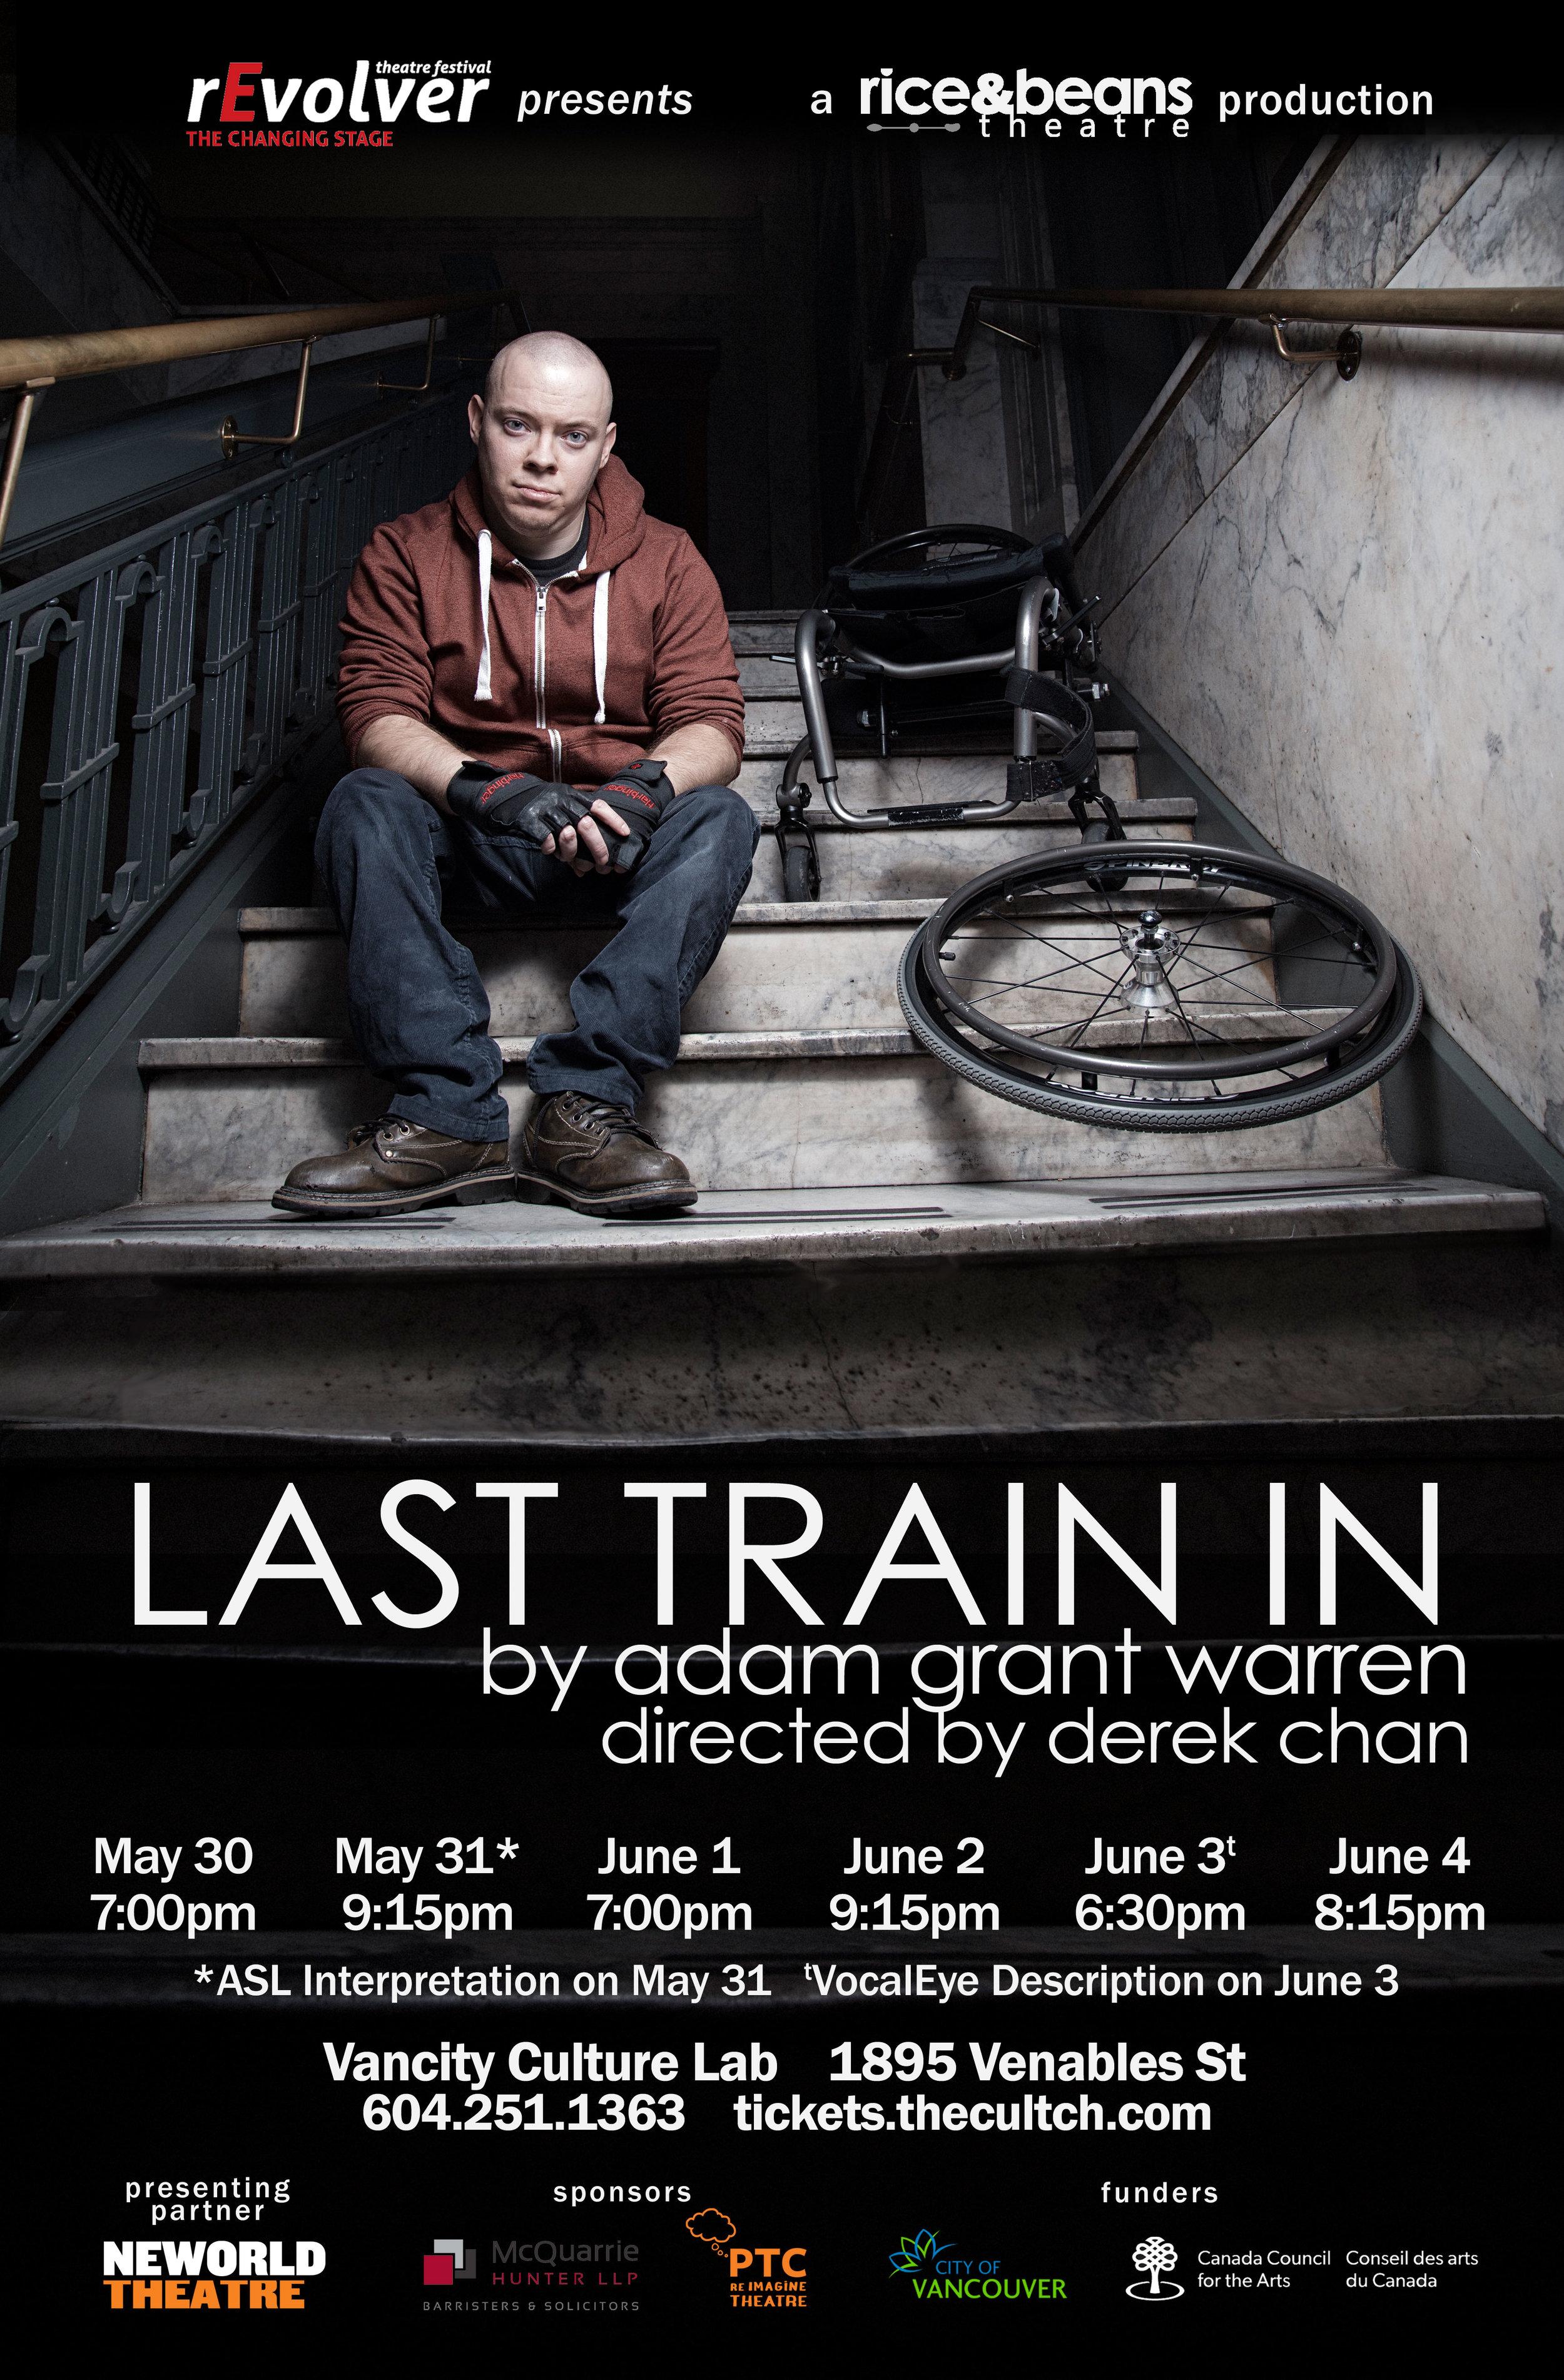 Last-Train-In_rEvolver_Apr21.jpg